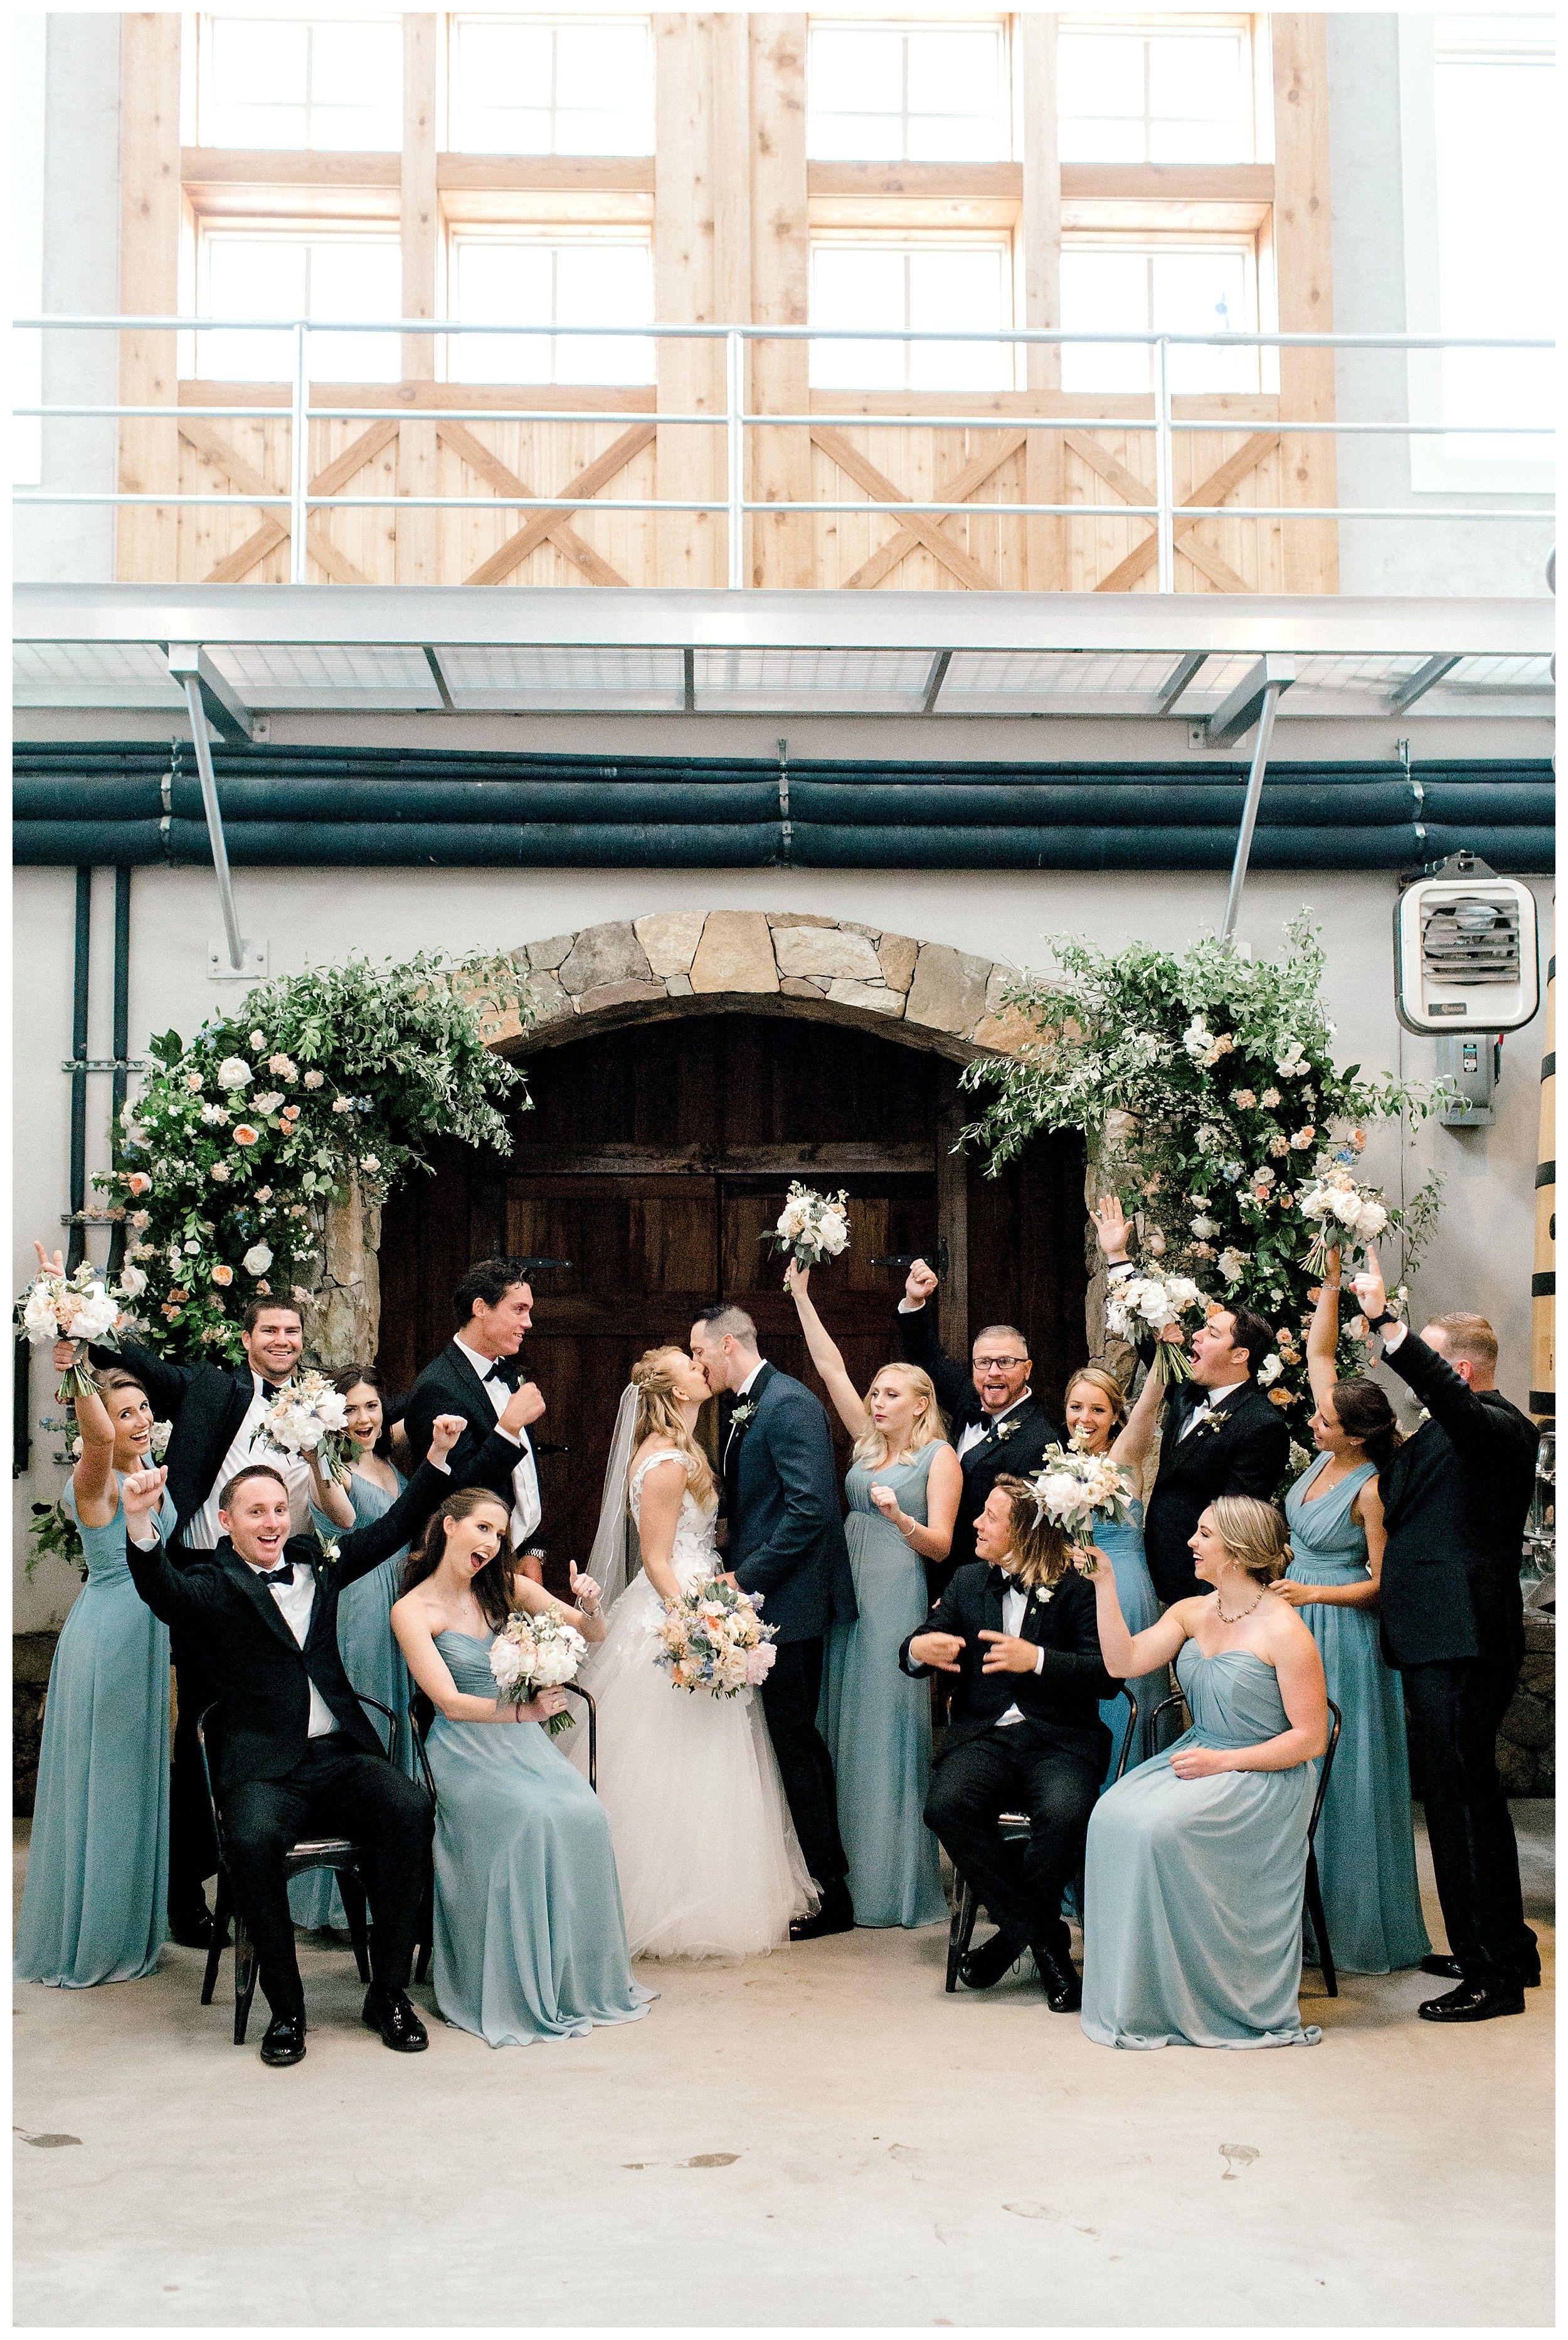 Stone Tower Winery Wedding Wedding dress cost, Wedding